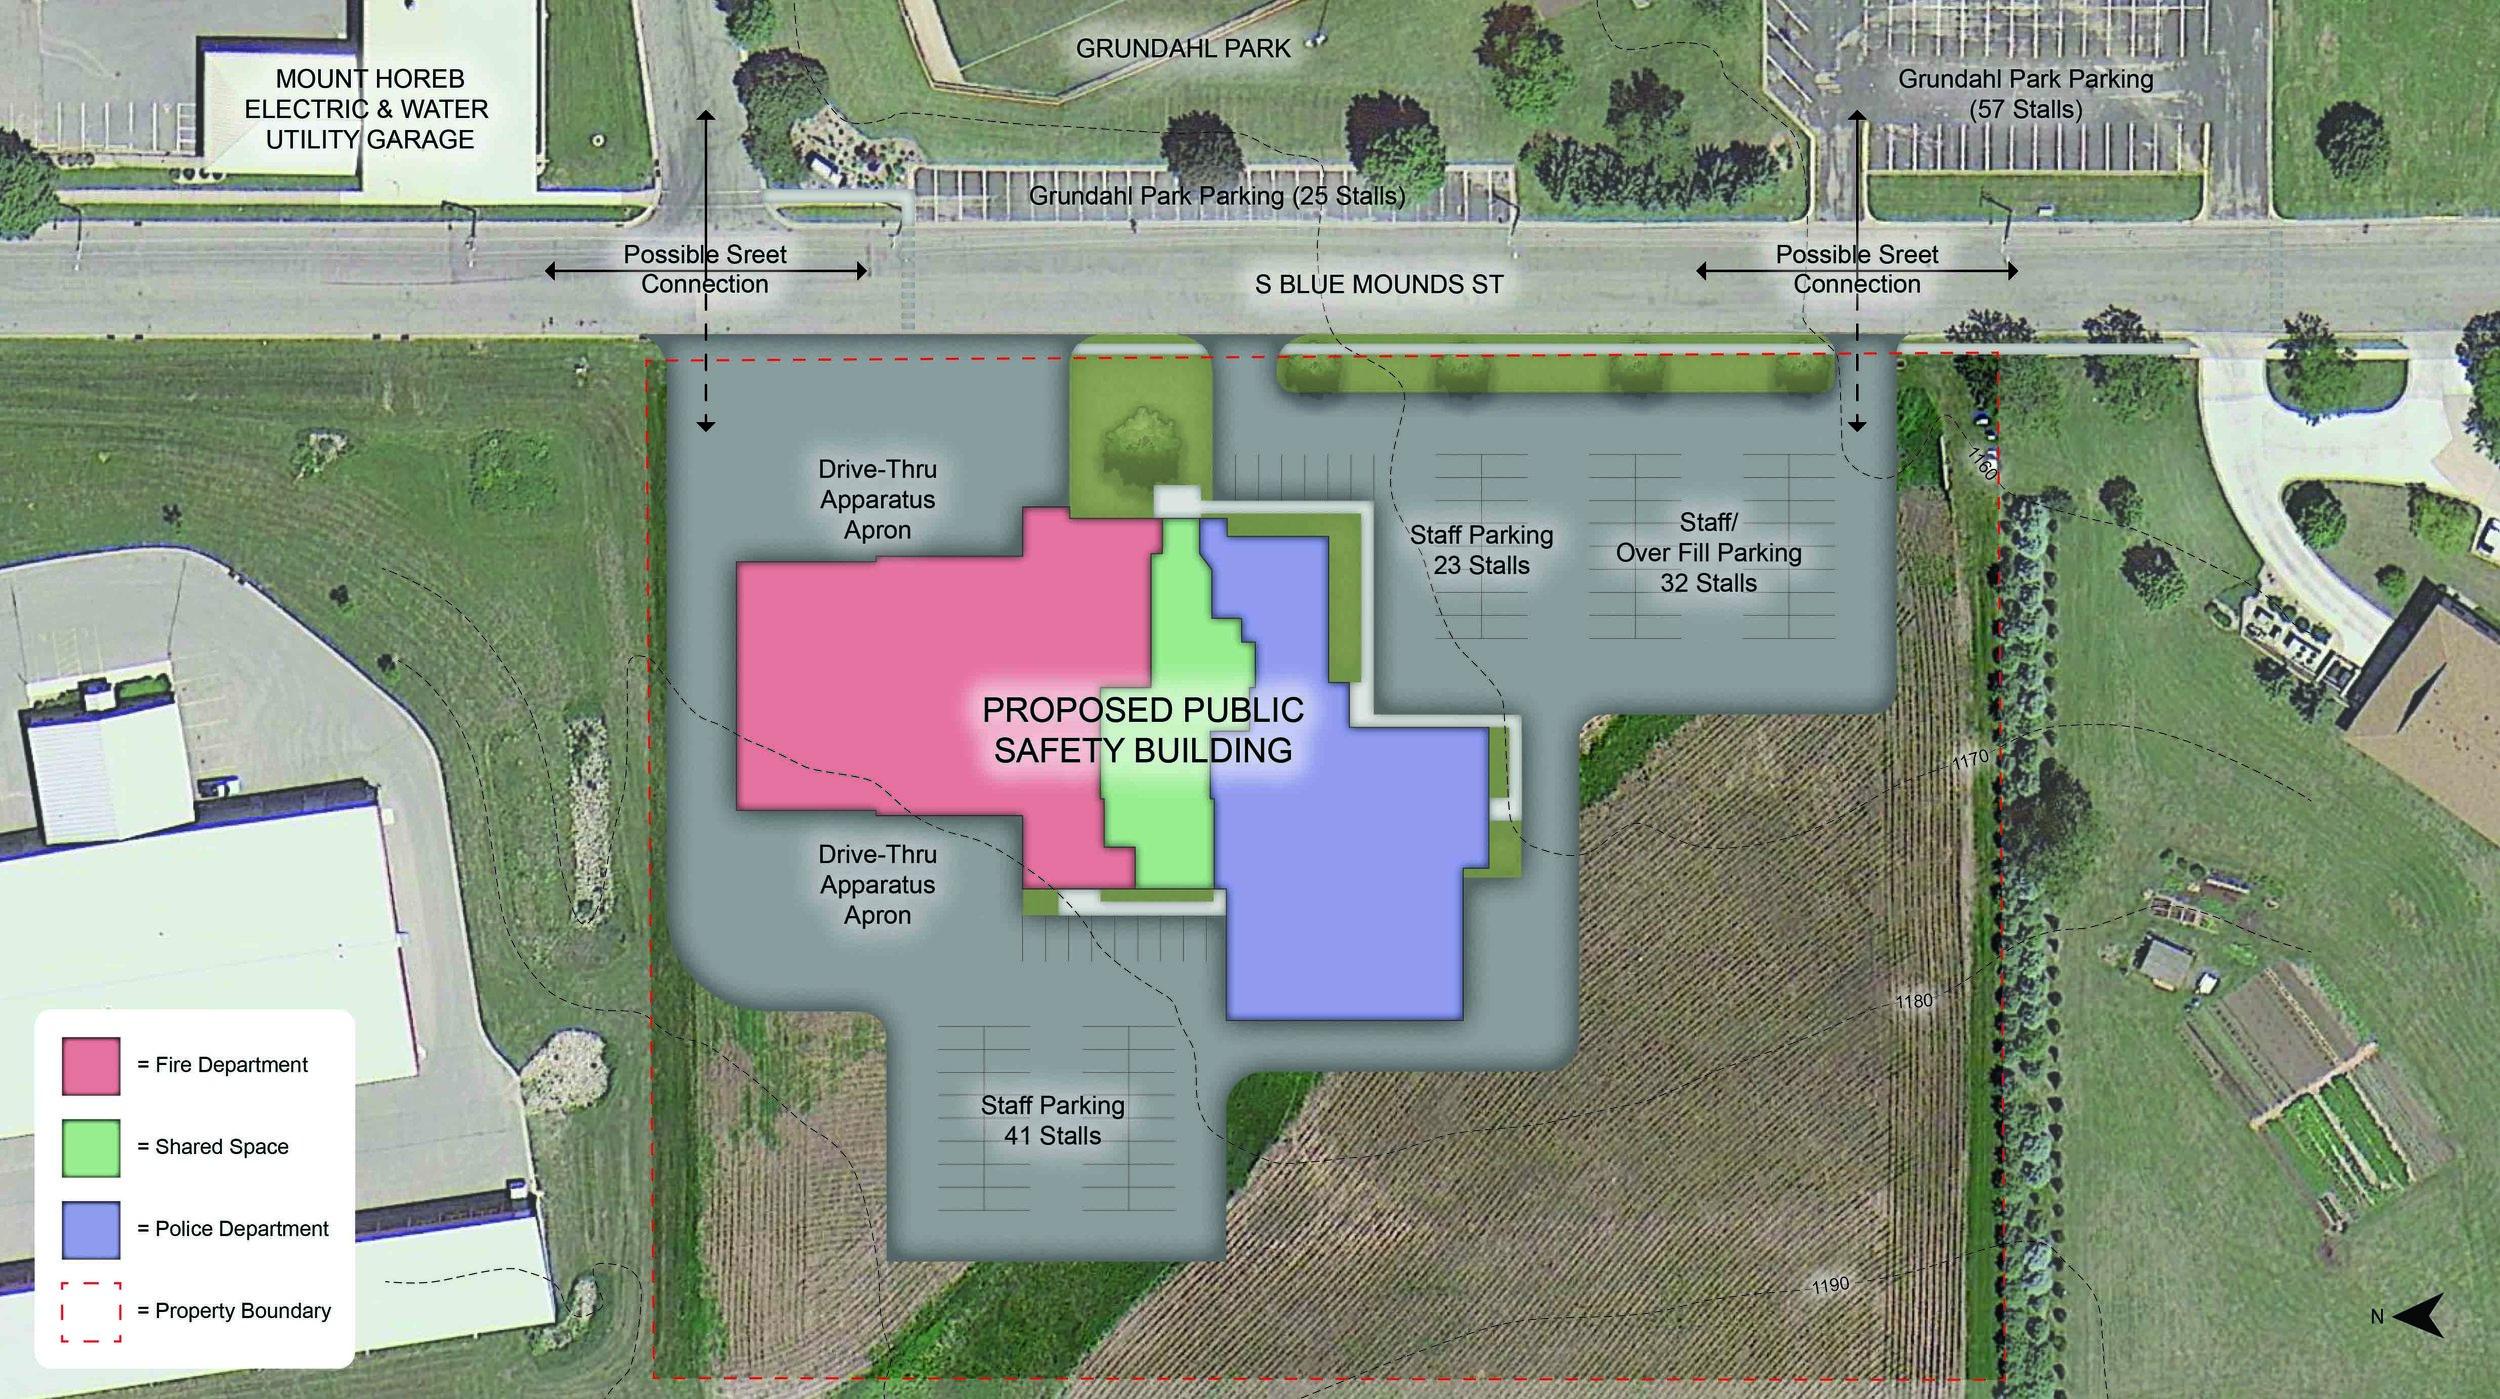 Conceptual Site Plan of Mount Horeb Public Safety Building